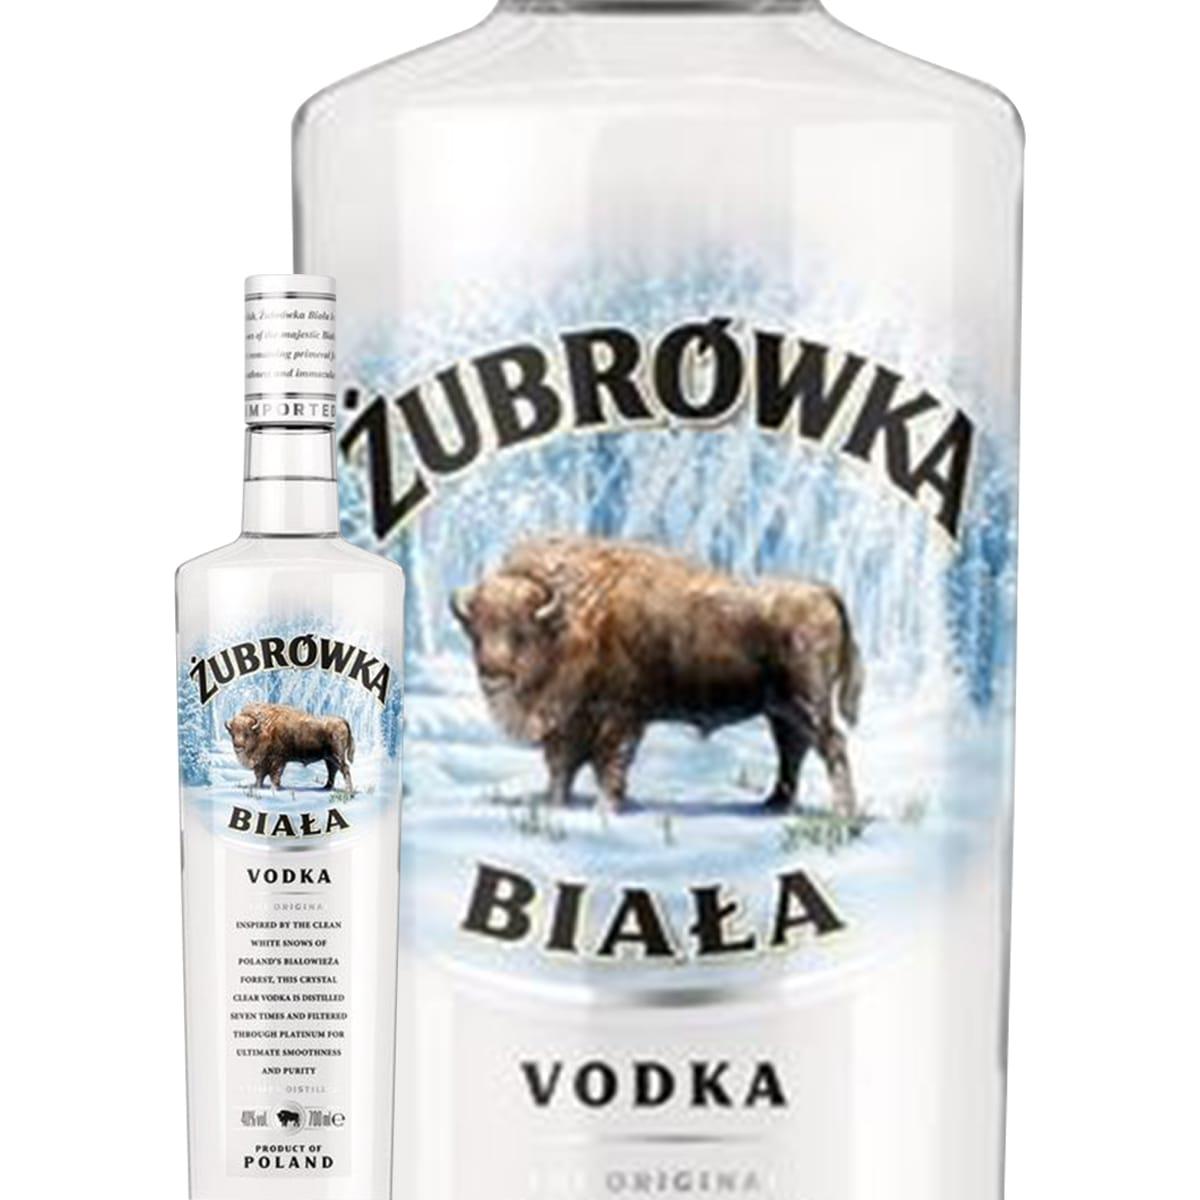 Bouteille de vodka Zubrowka Biala Winter Rye - 40° (via 4.35€ sur la carte Waaoh)